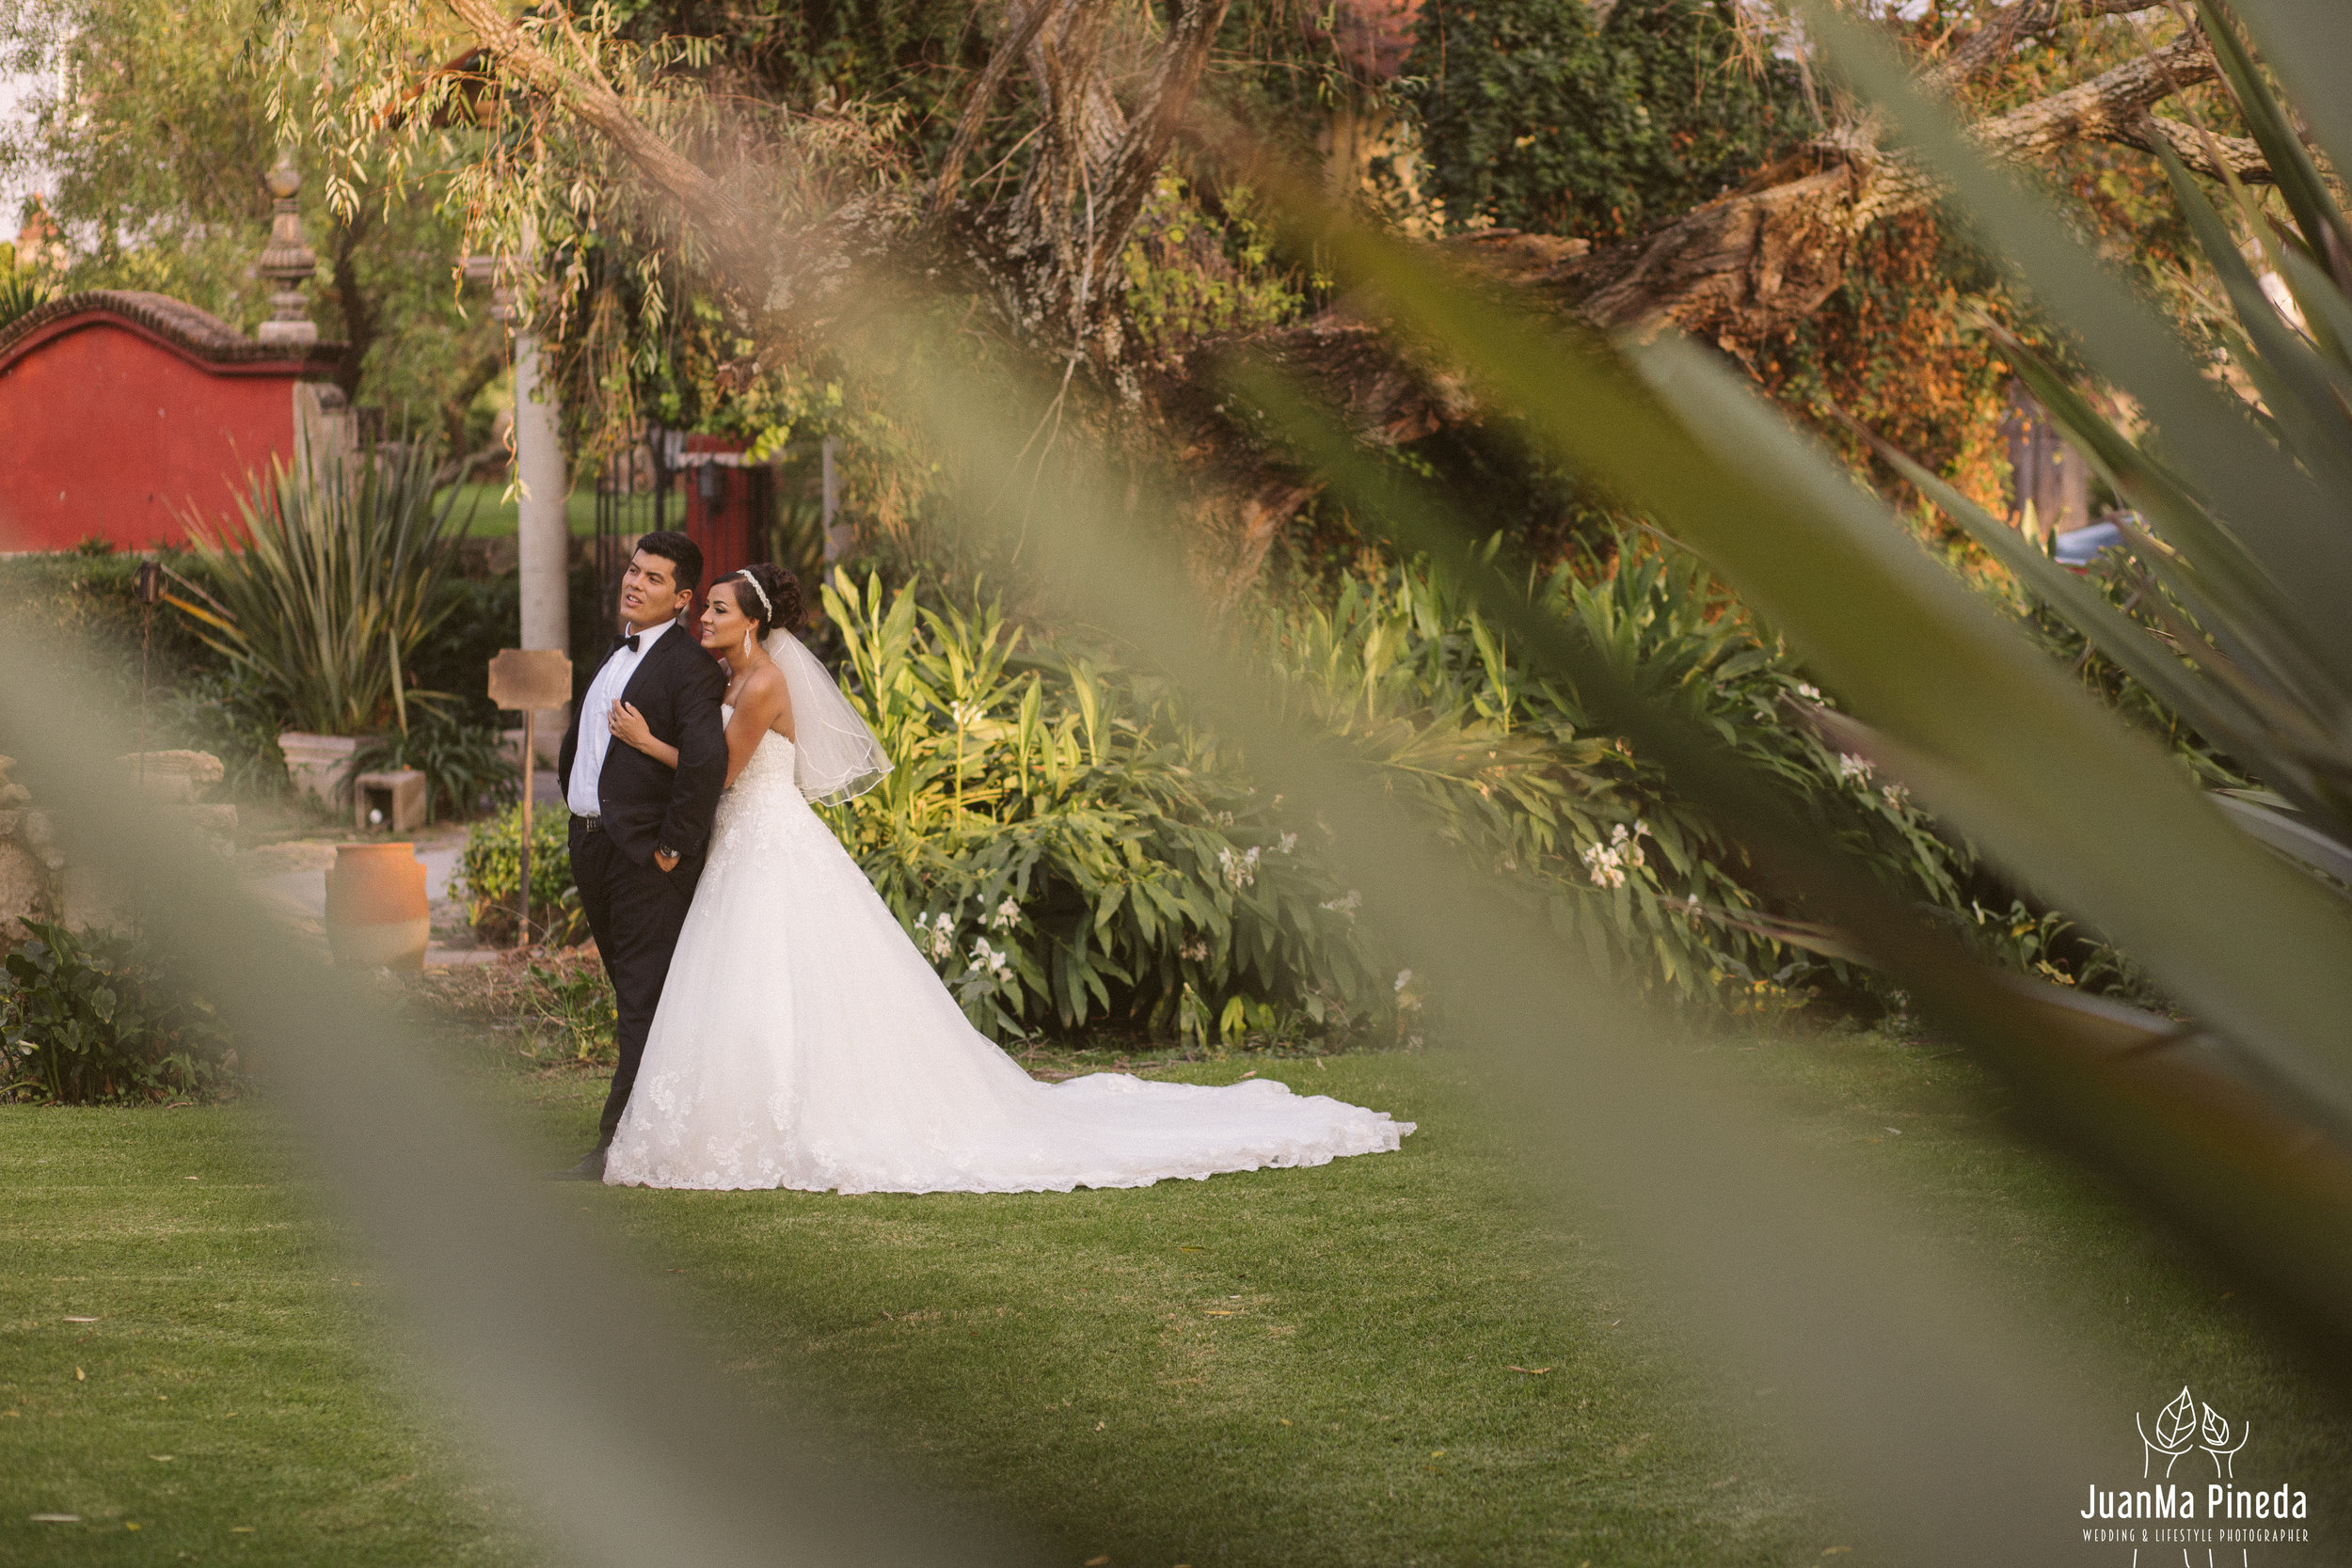 Wedding+Photographer+Mexico-1-5.jpg